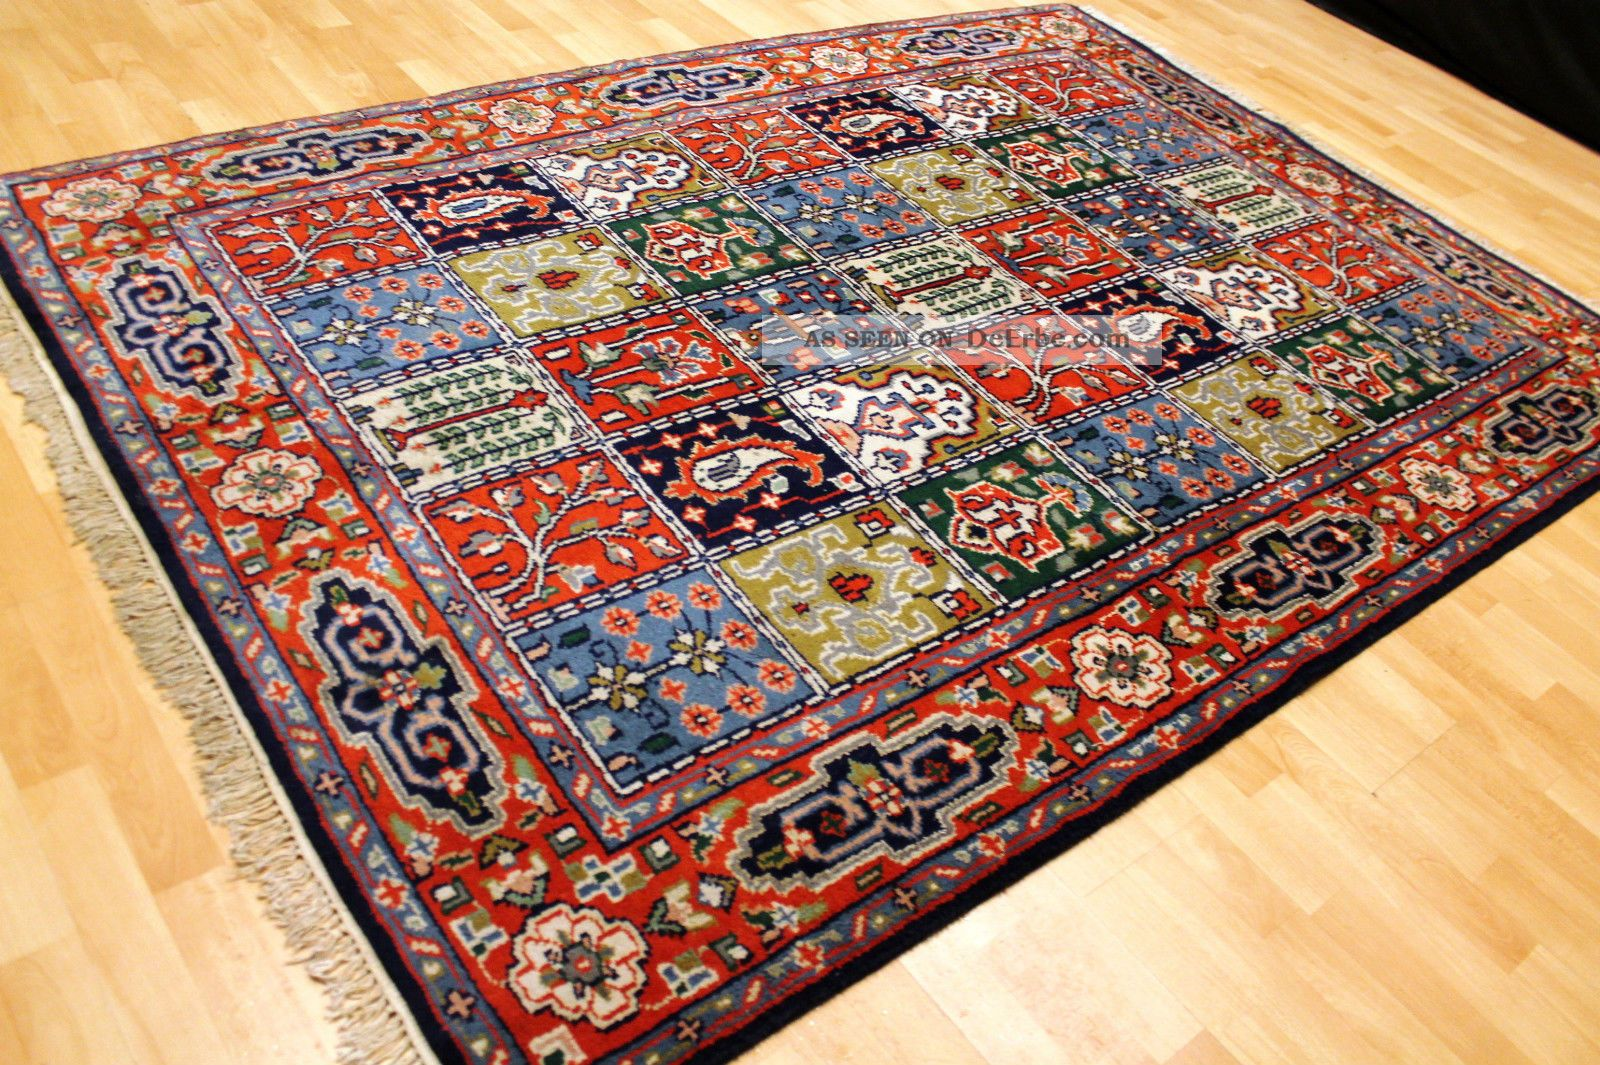 alter felder bilder garten bachtiar 240x170cm orient teppich tappeto rug 3506. Black Bedroom Furniture Sets. Home Design Ideas